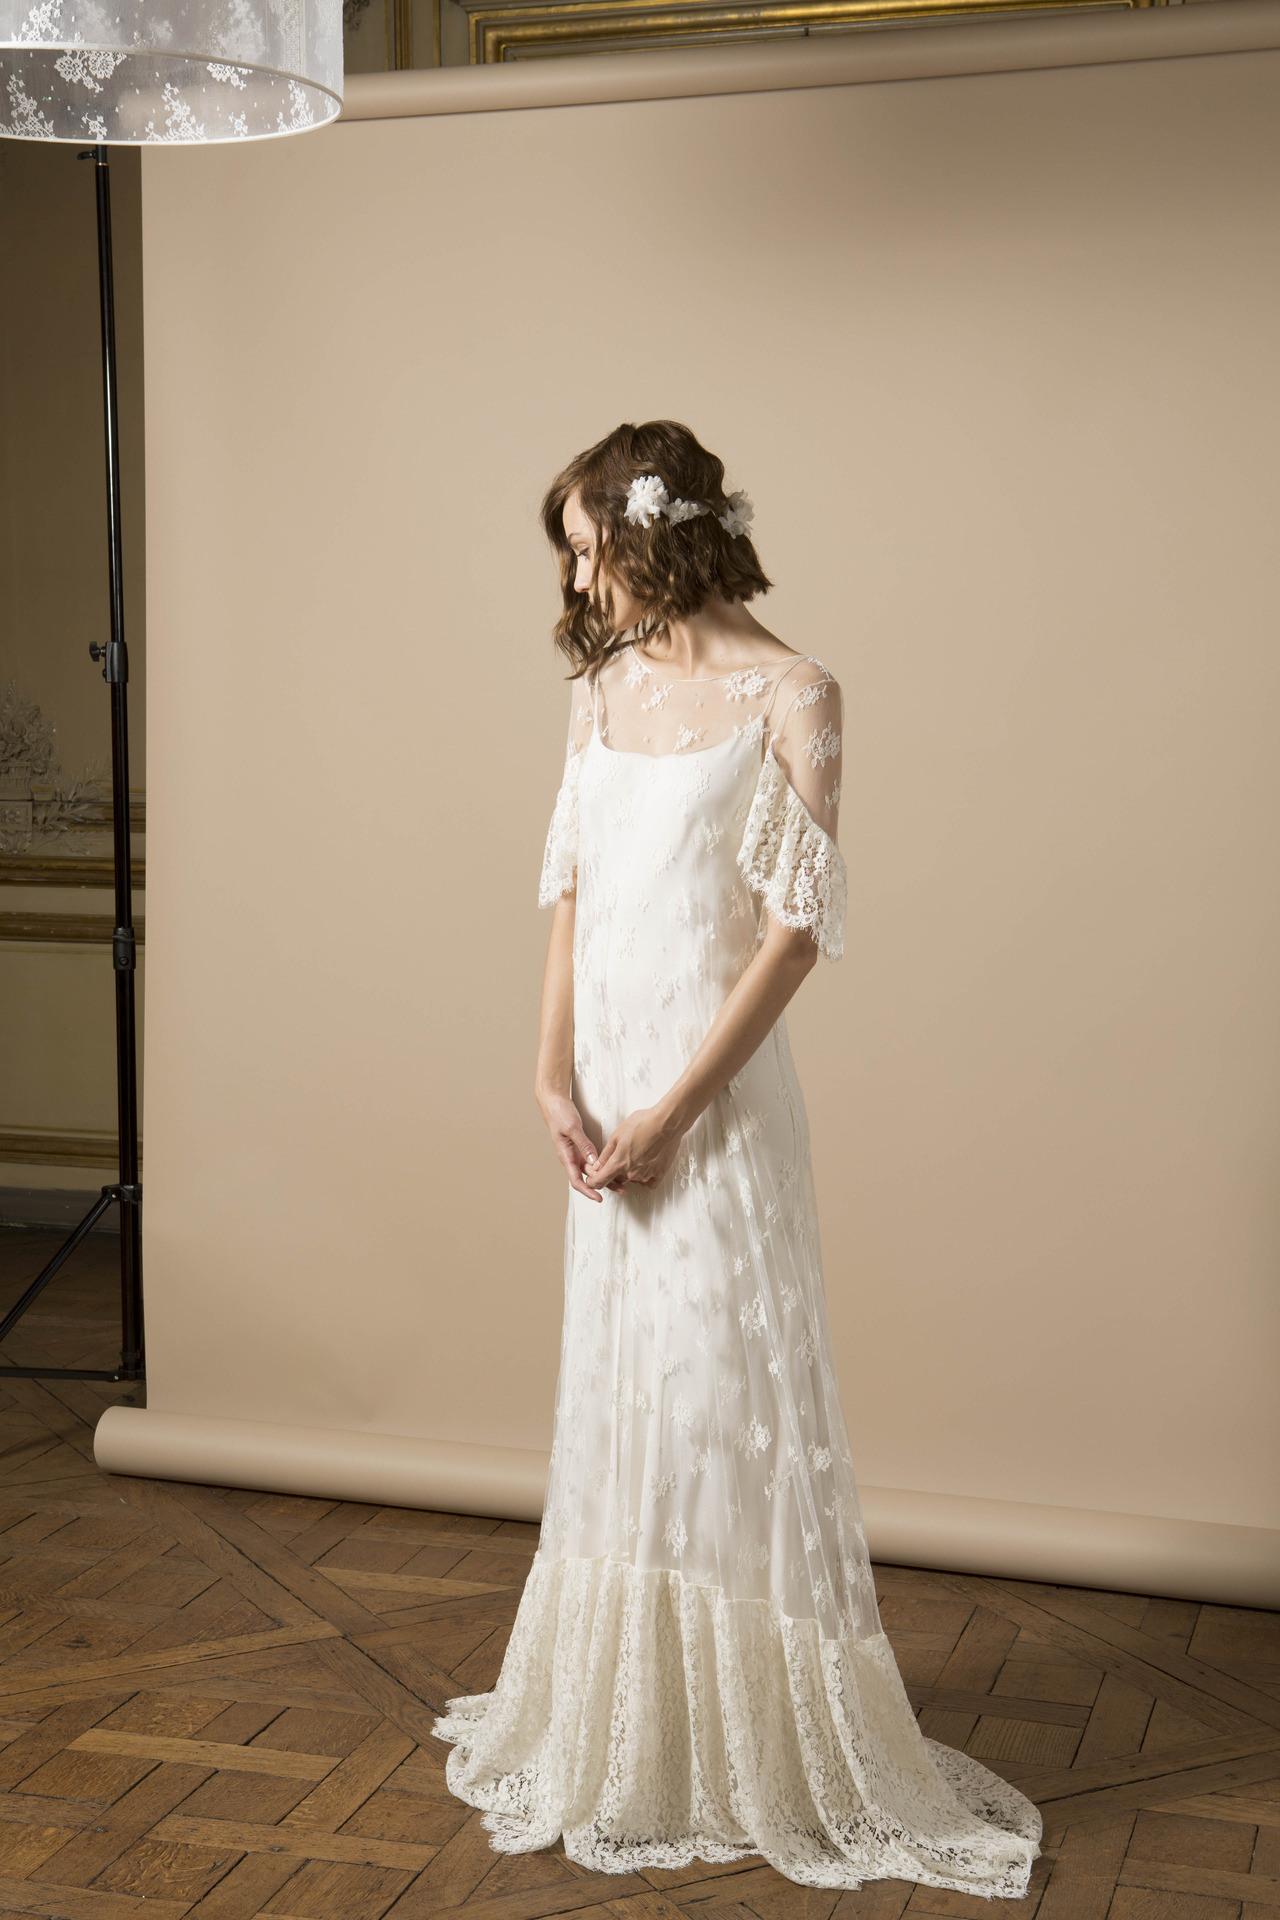 La robe de mariée tendance vintage a la cote - Mariage.com